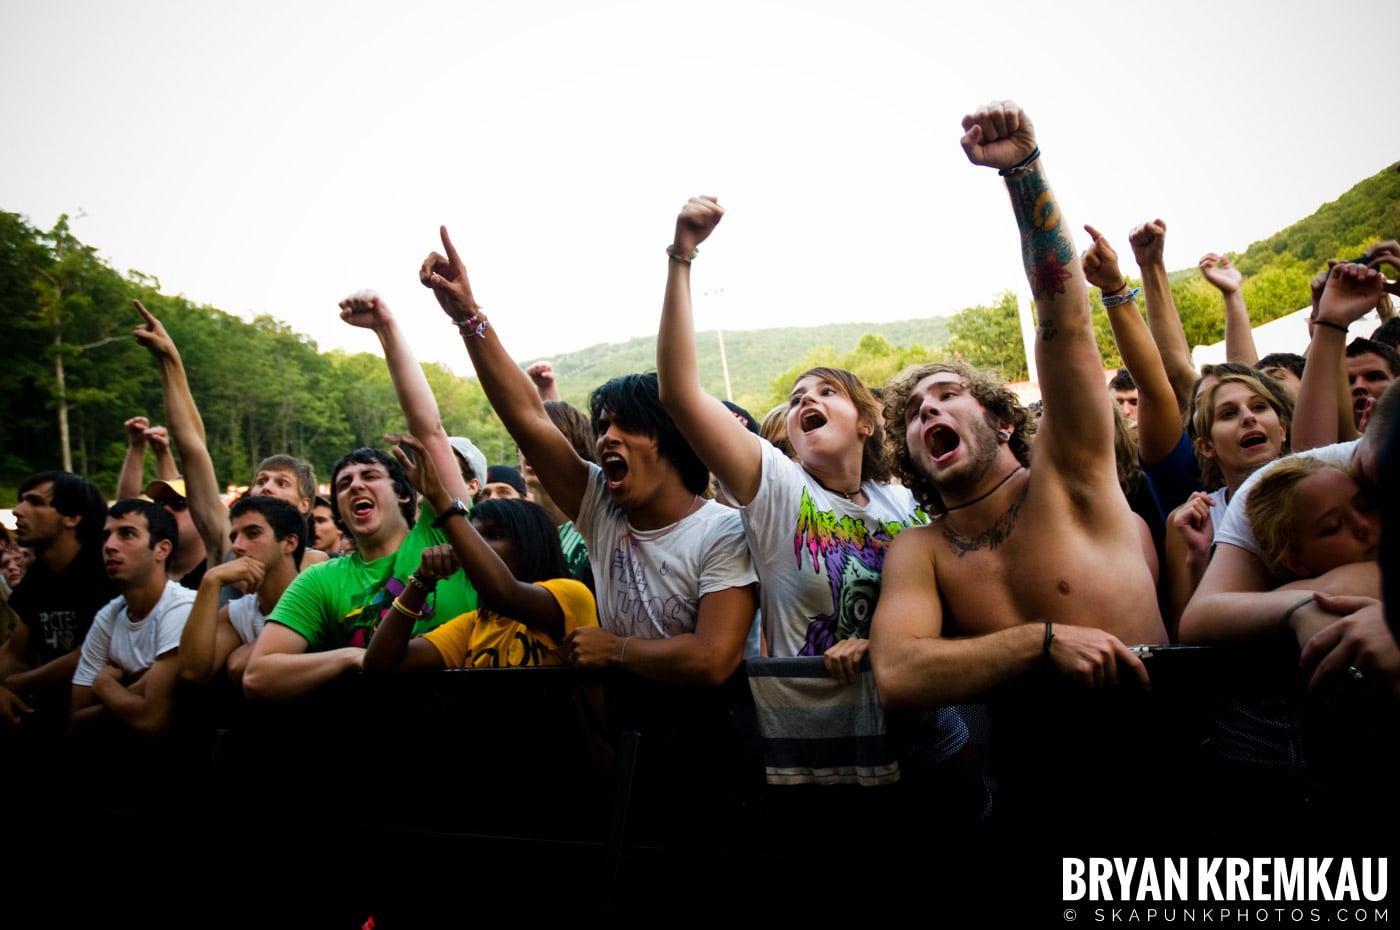 Everytime I Die @ Warped Tour 08, Scranton PA - 7.27.08 (5)